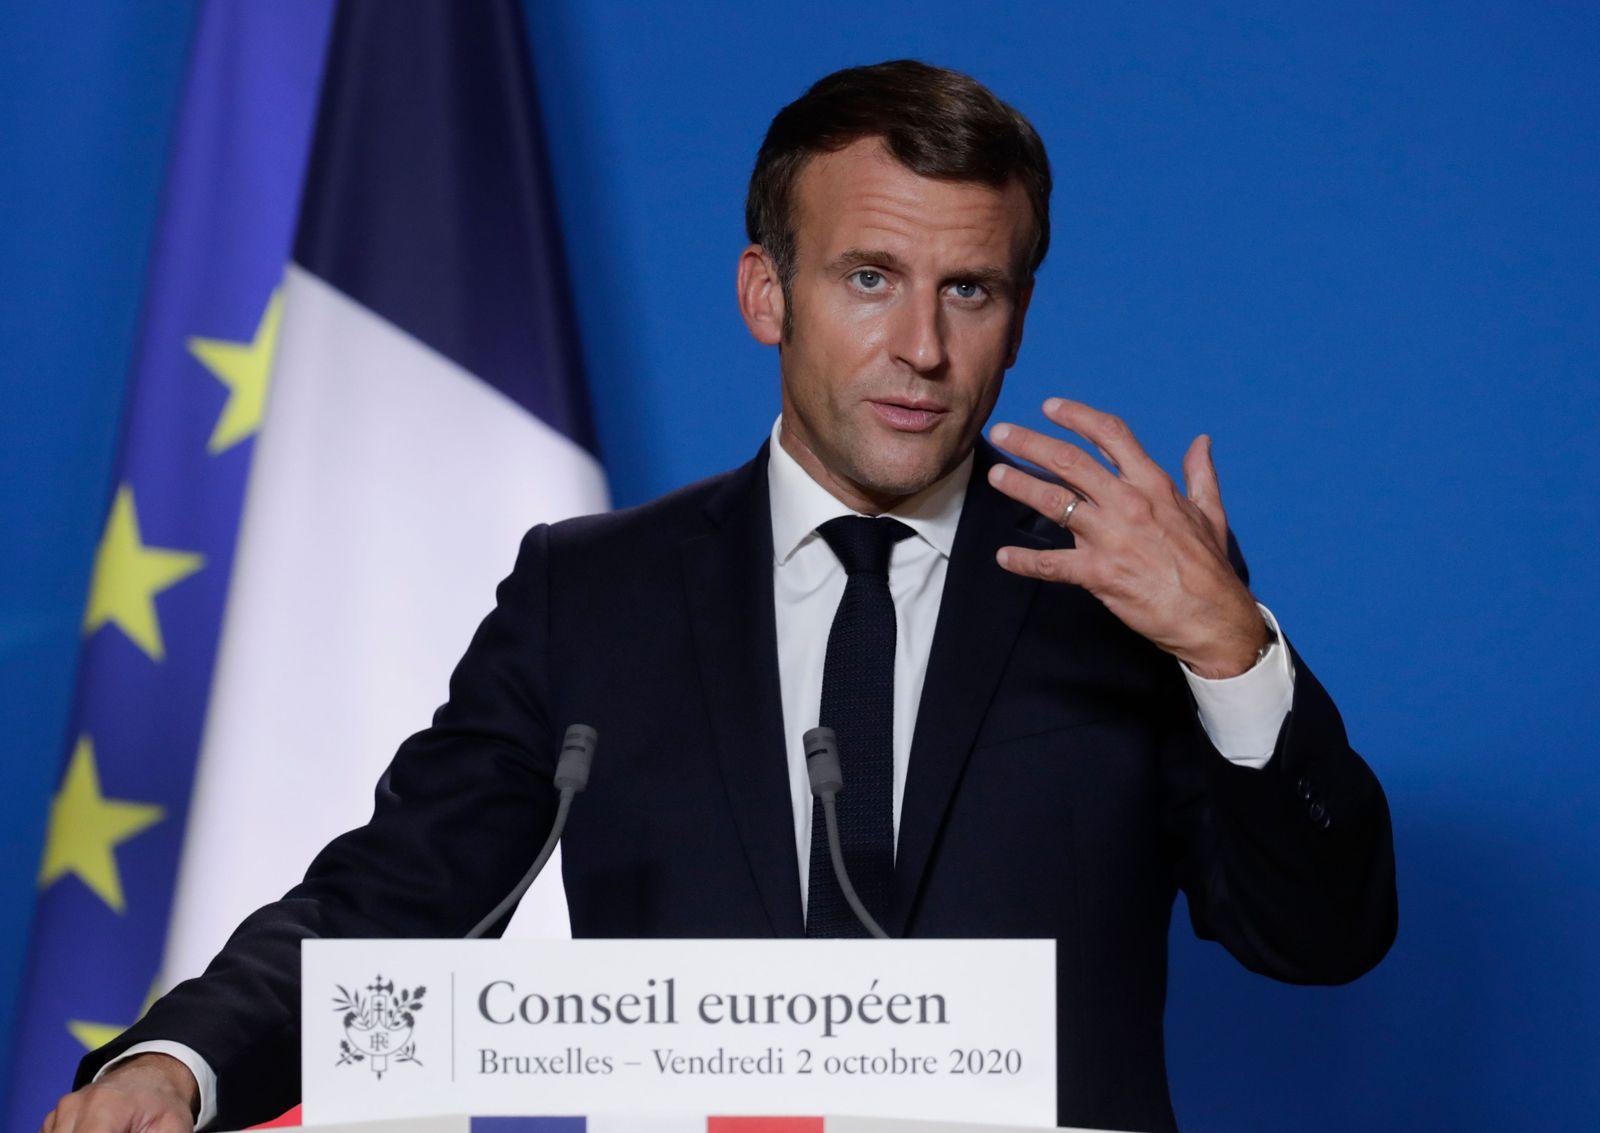 European Council meeting in Brussels, Belgium - 02 Oct 2020